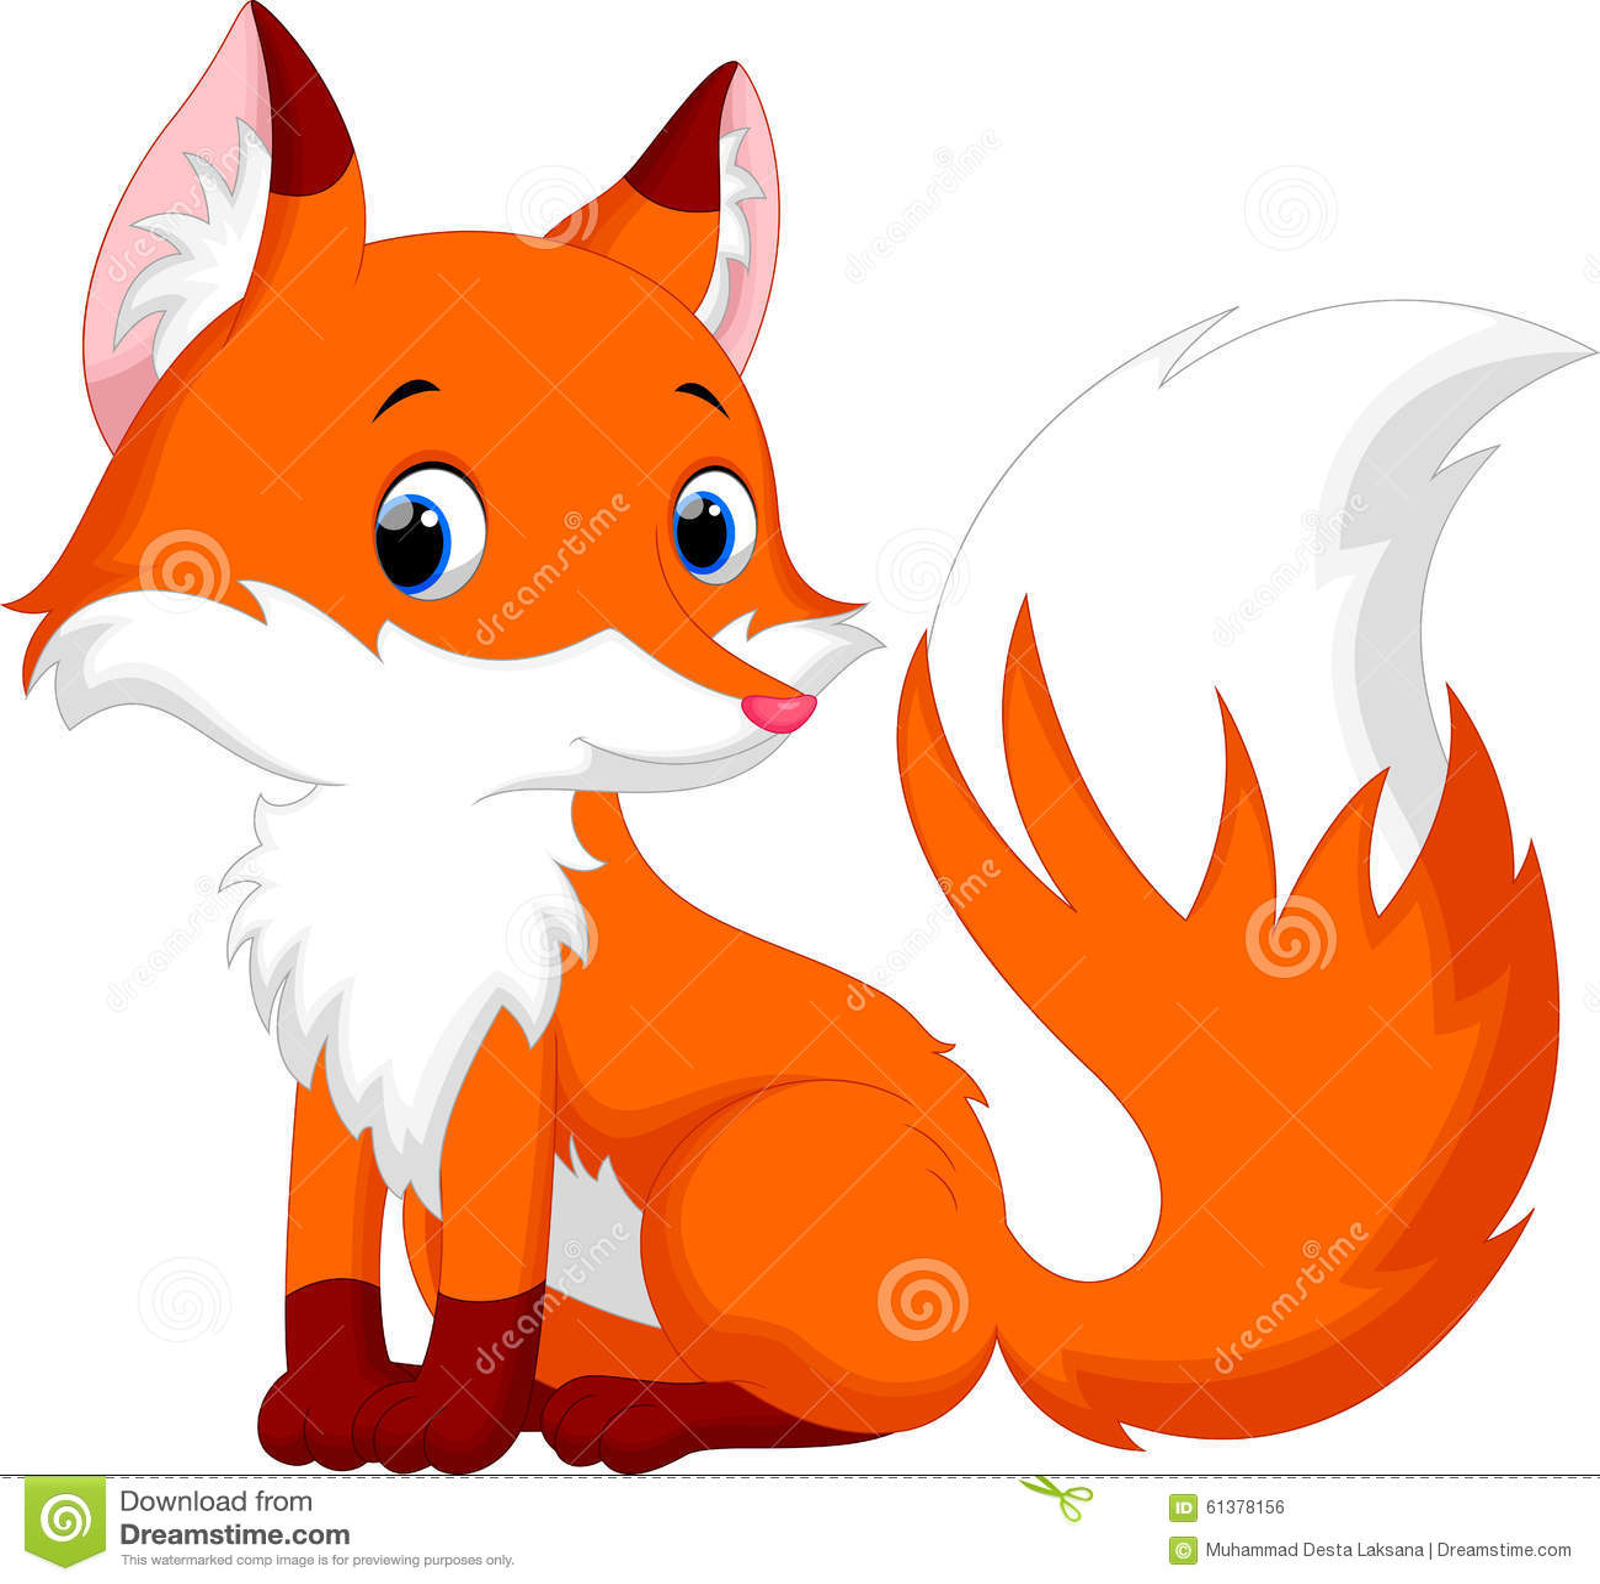 Cute fox cartoon stock illustration. Illustration of happy ...